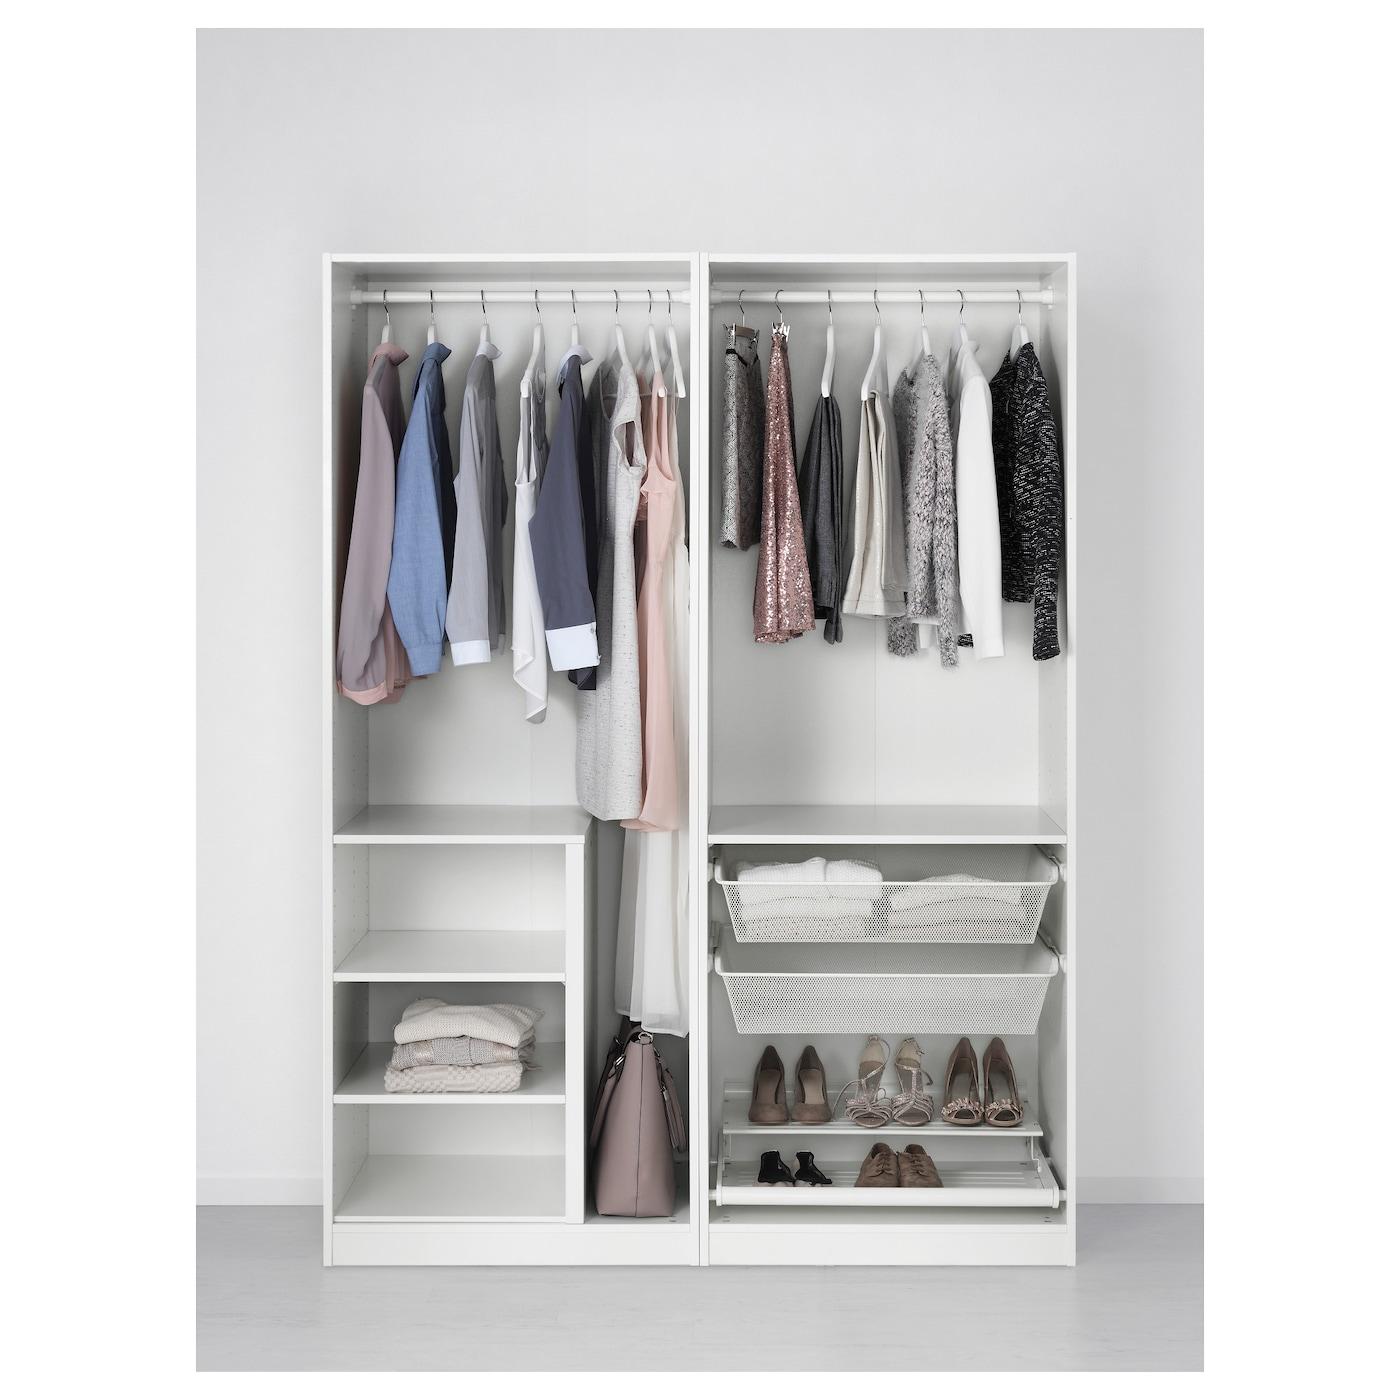 pax armoire penderie blanc sekken verre givr 150 x 66 x 201 cm ikea. Black Bedroom Furniture Sets. Home Design Ideas